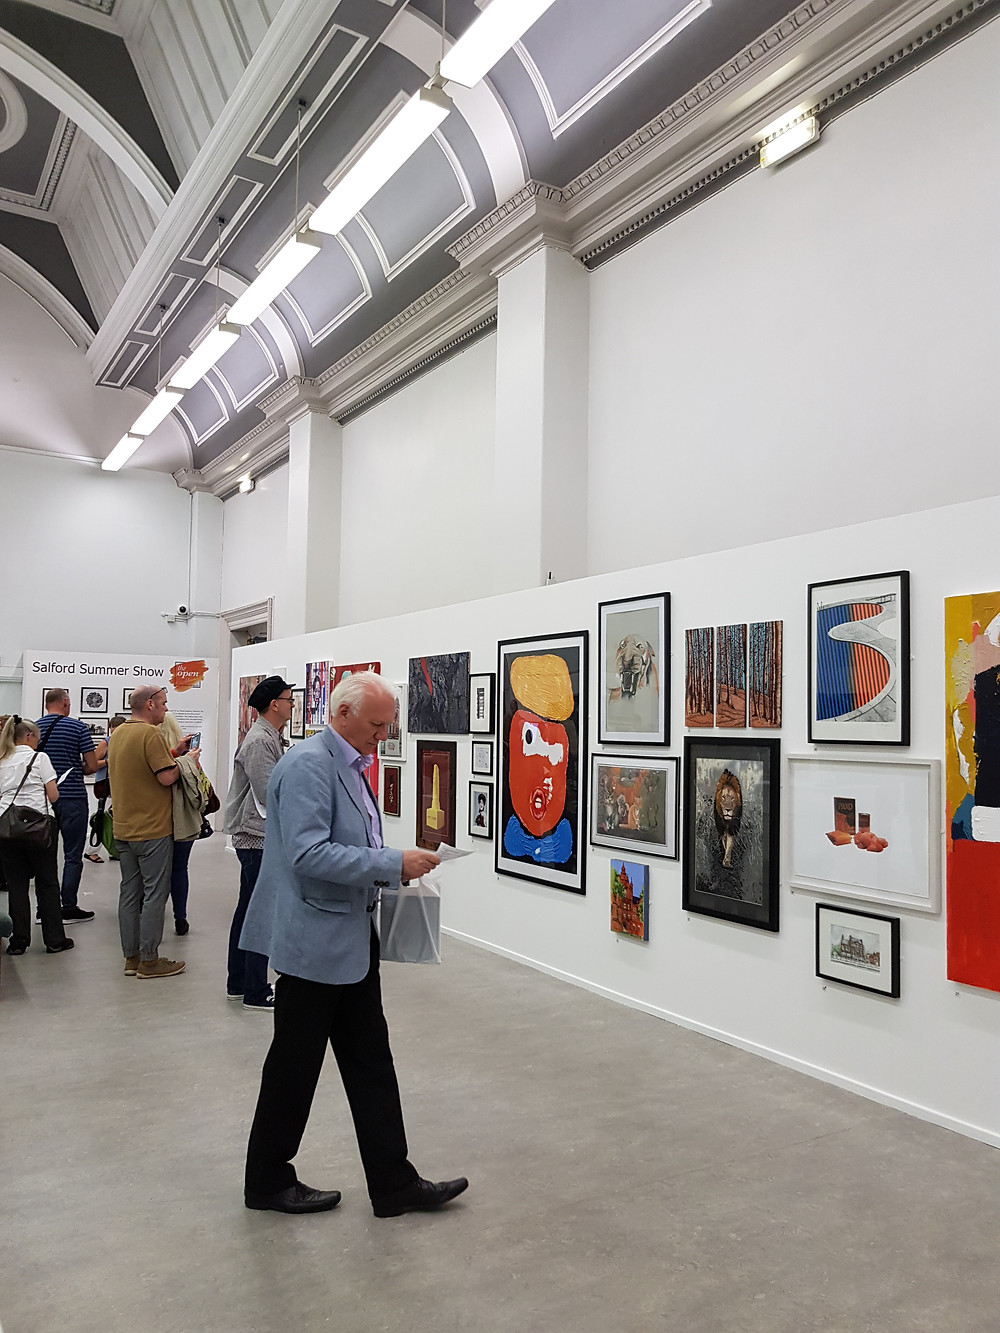 Exhibits at Salford Summer Art Show